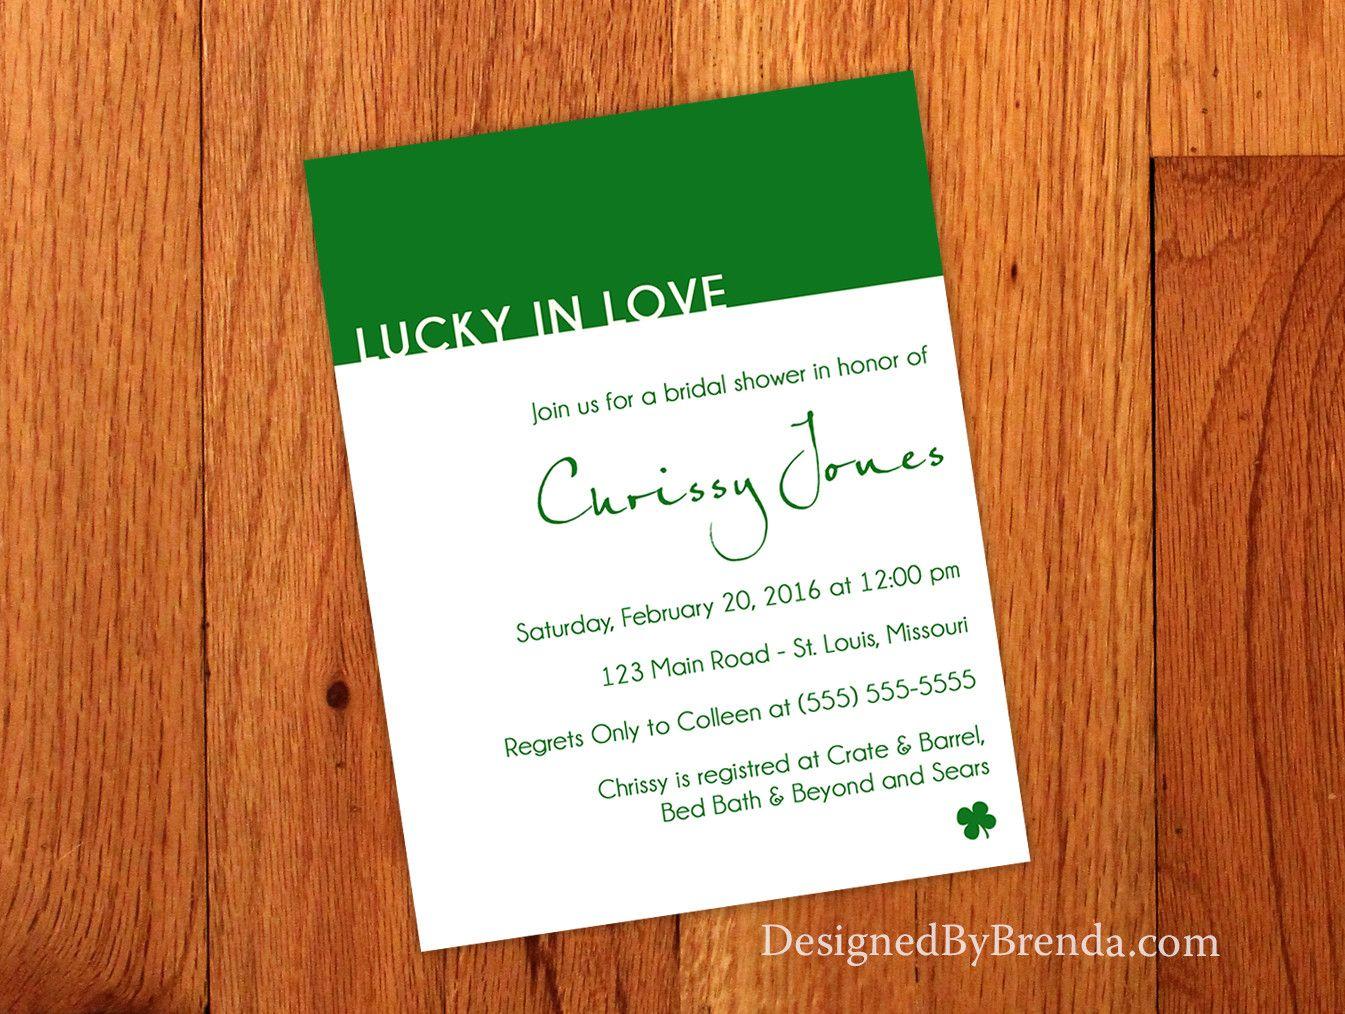 blank beach bridal shower invitations%0A Modern Lucky in Love Wedding Shower Invitation  Kelly Green